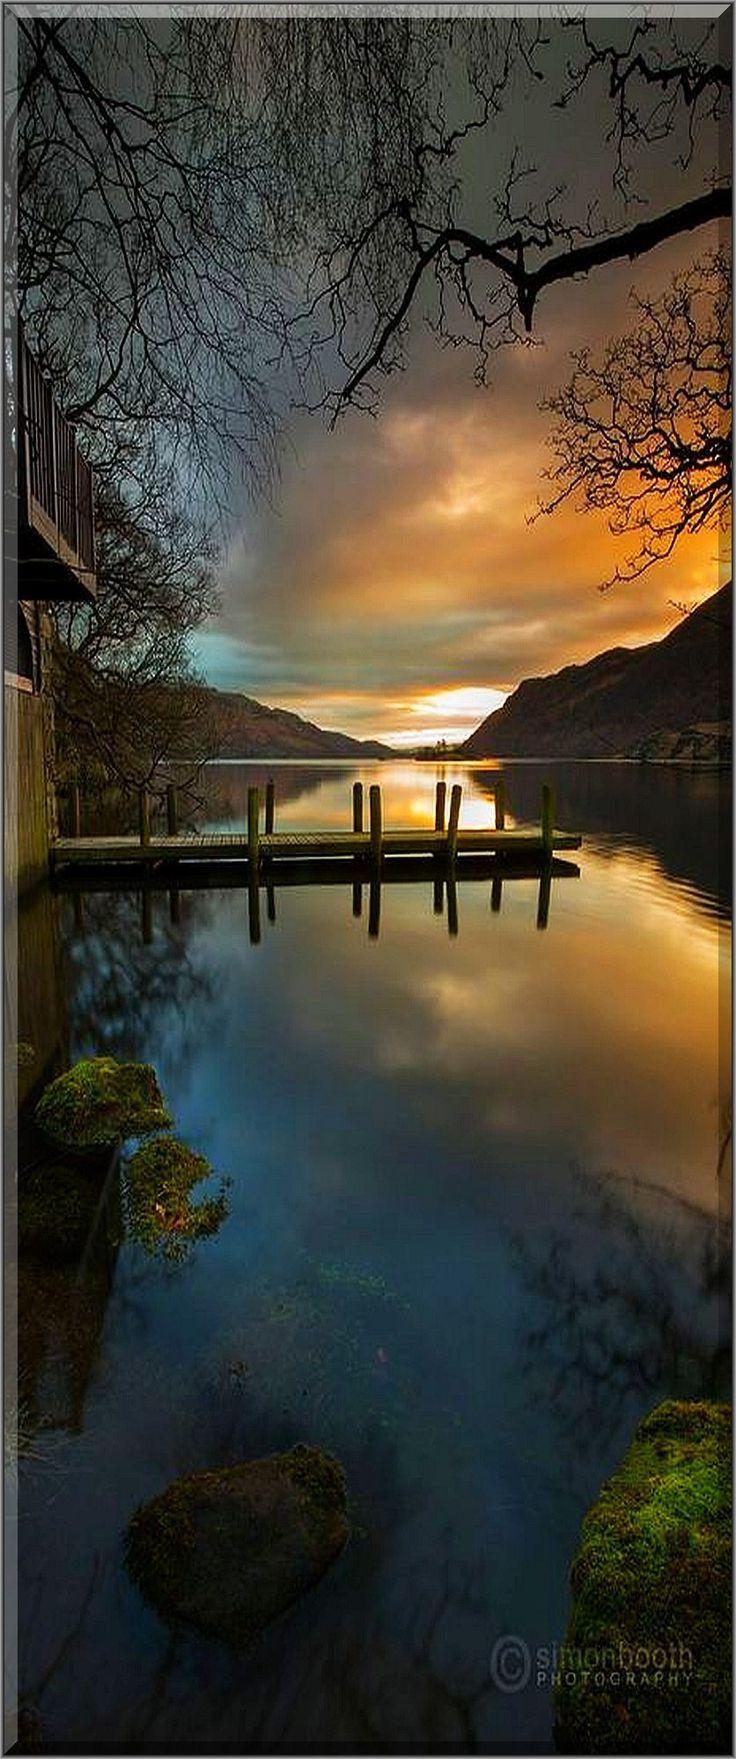 Ullswater Boathouse Lake District National Park Uk England Photo By Simon Booth Aergo Beautiful Landscapes Beautiful Nature Landscape Photography